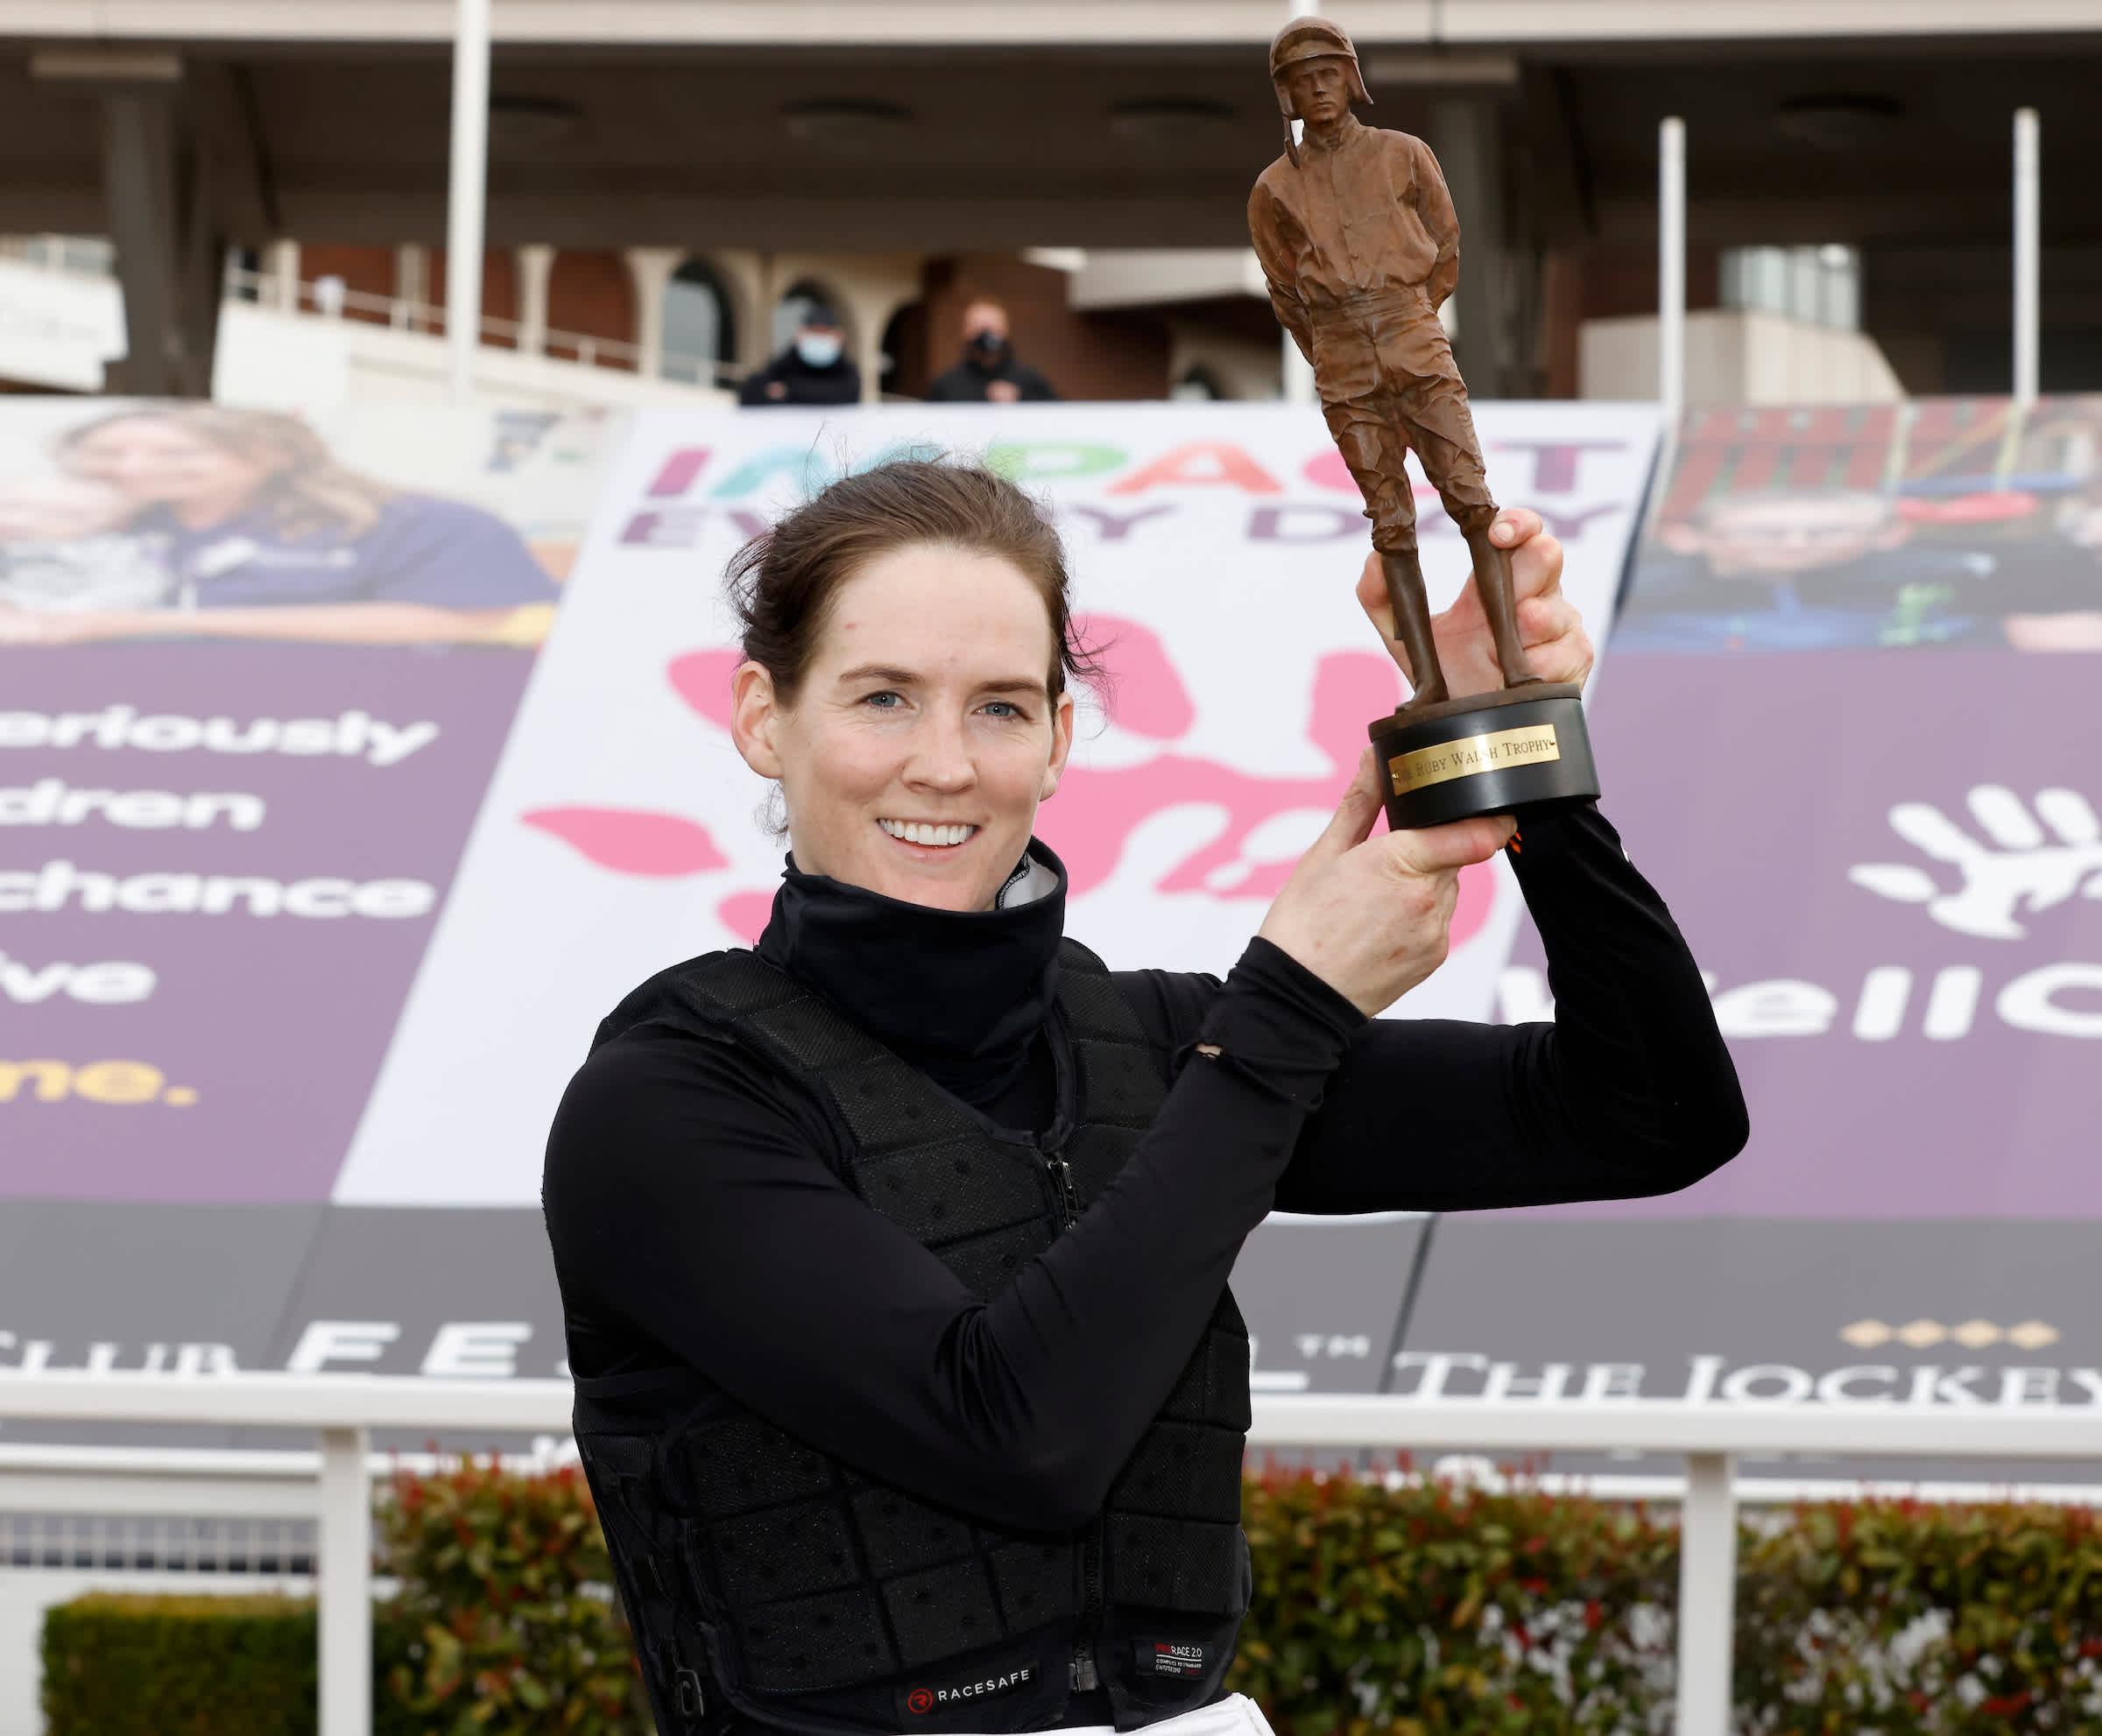 Randox Grand National: Rachael Blackmore bids for history ...